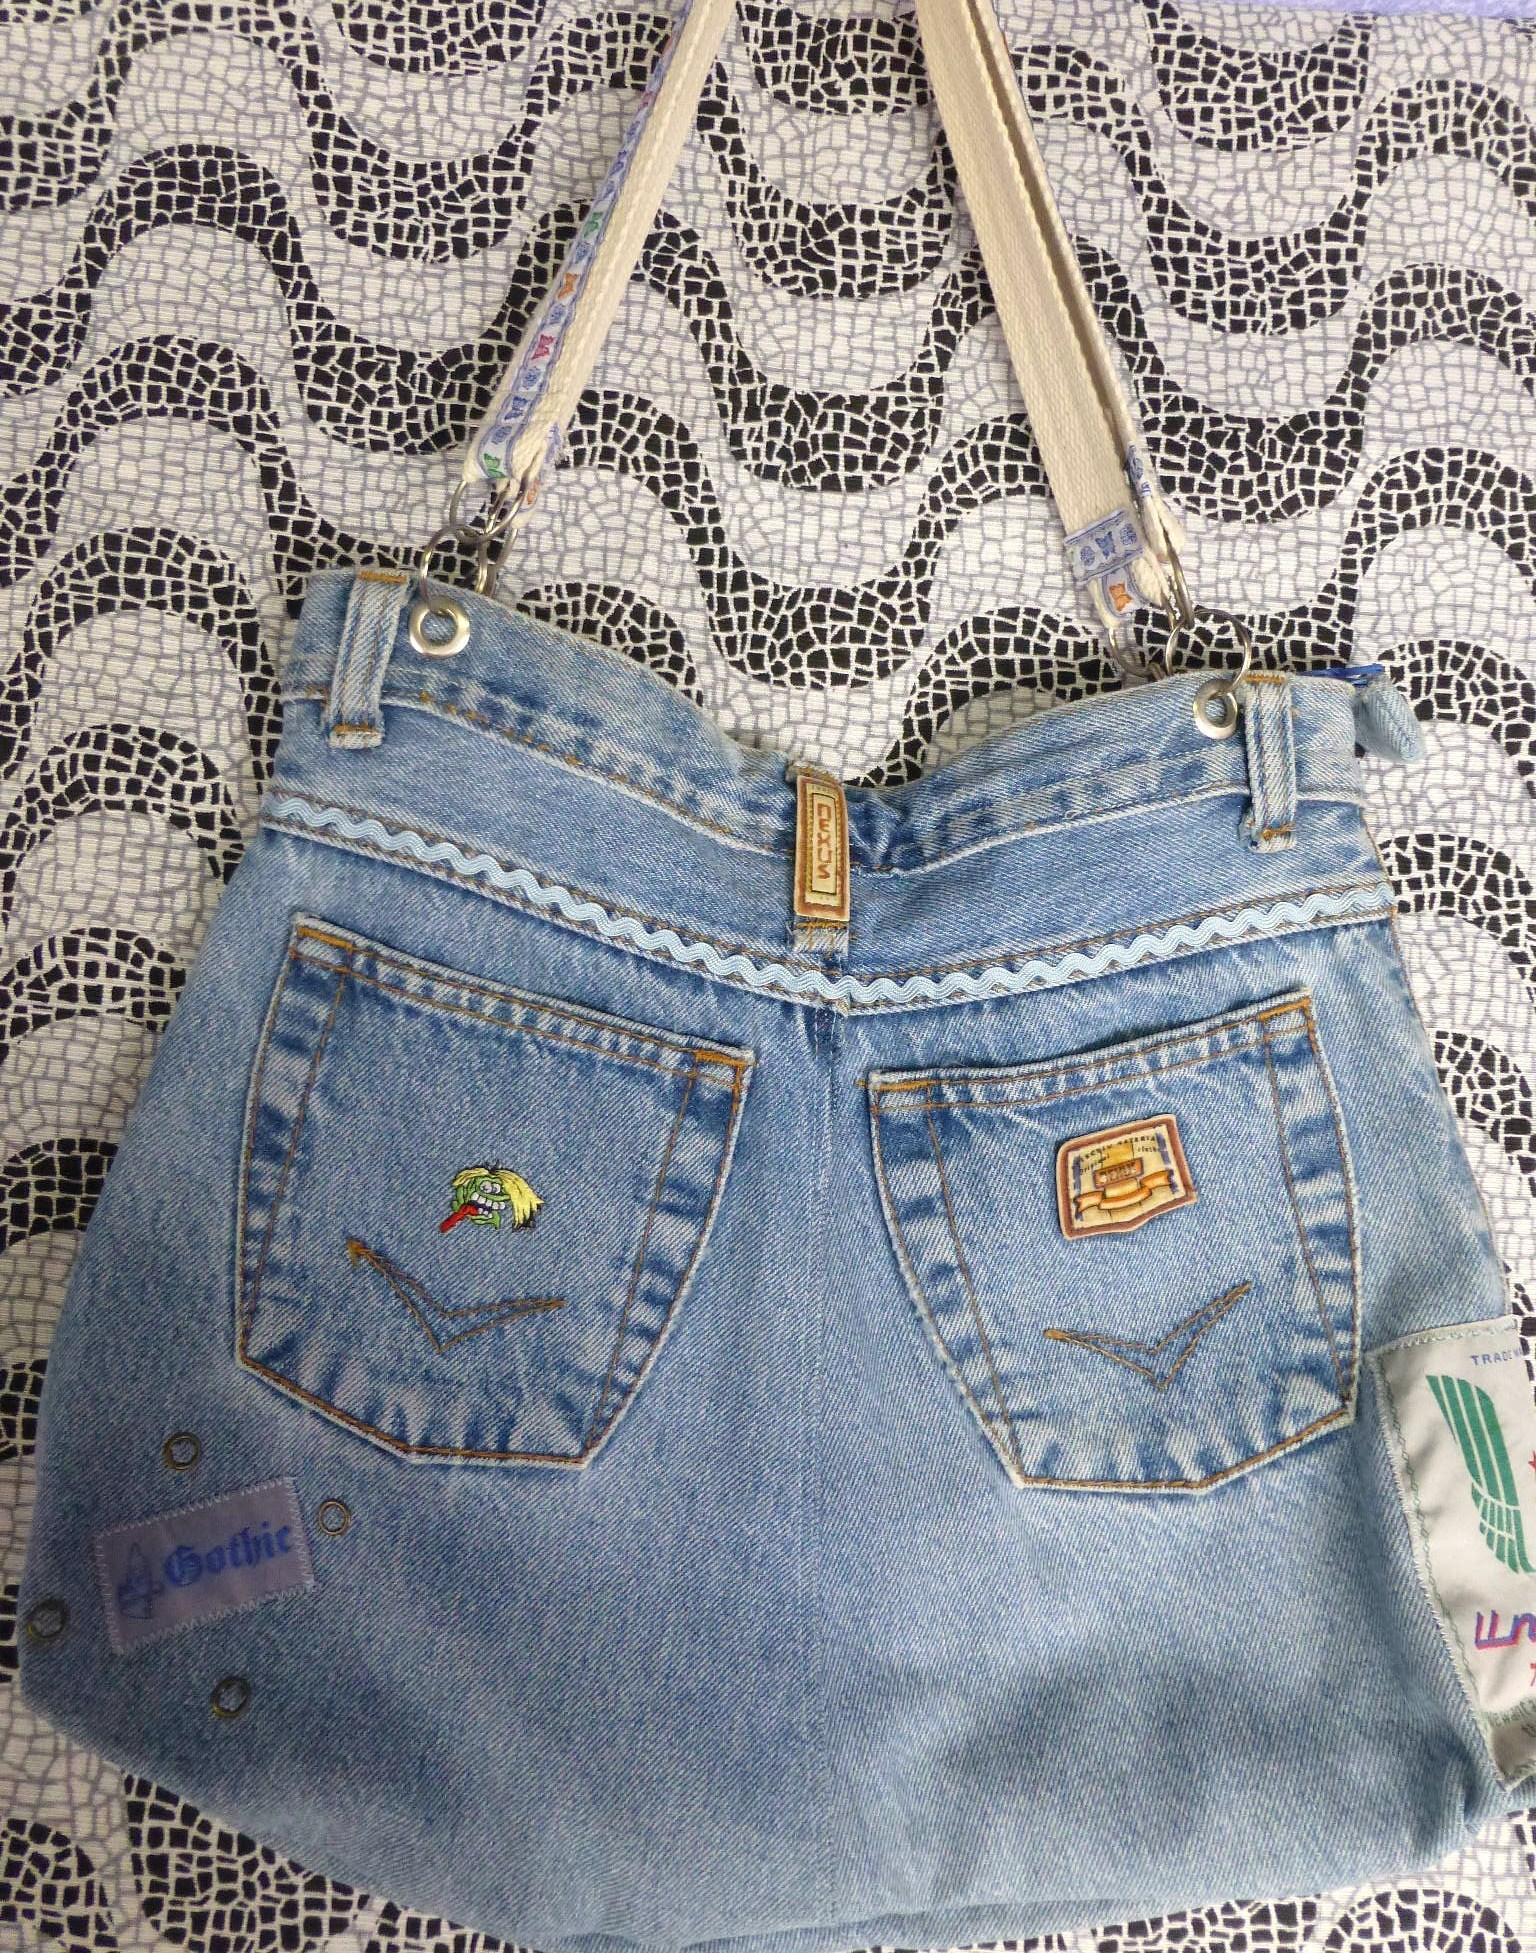 Bolsa De Cal  A Jeans Customizada Bolsa De Cal  A Jeans Customizada